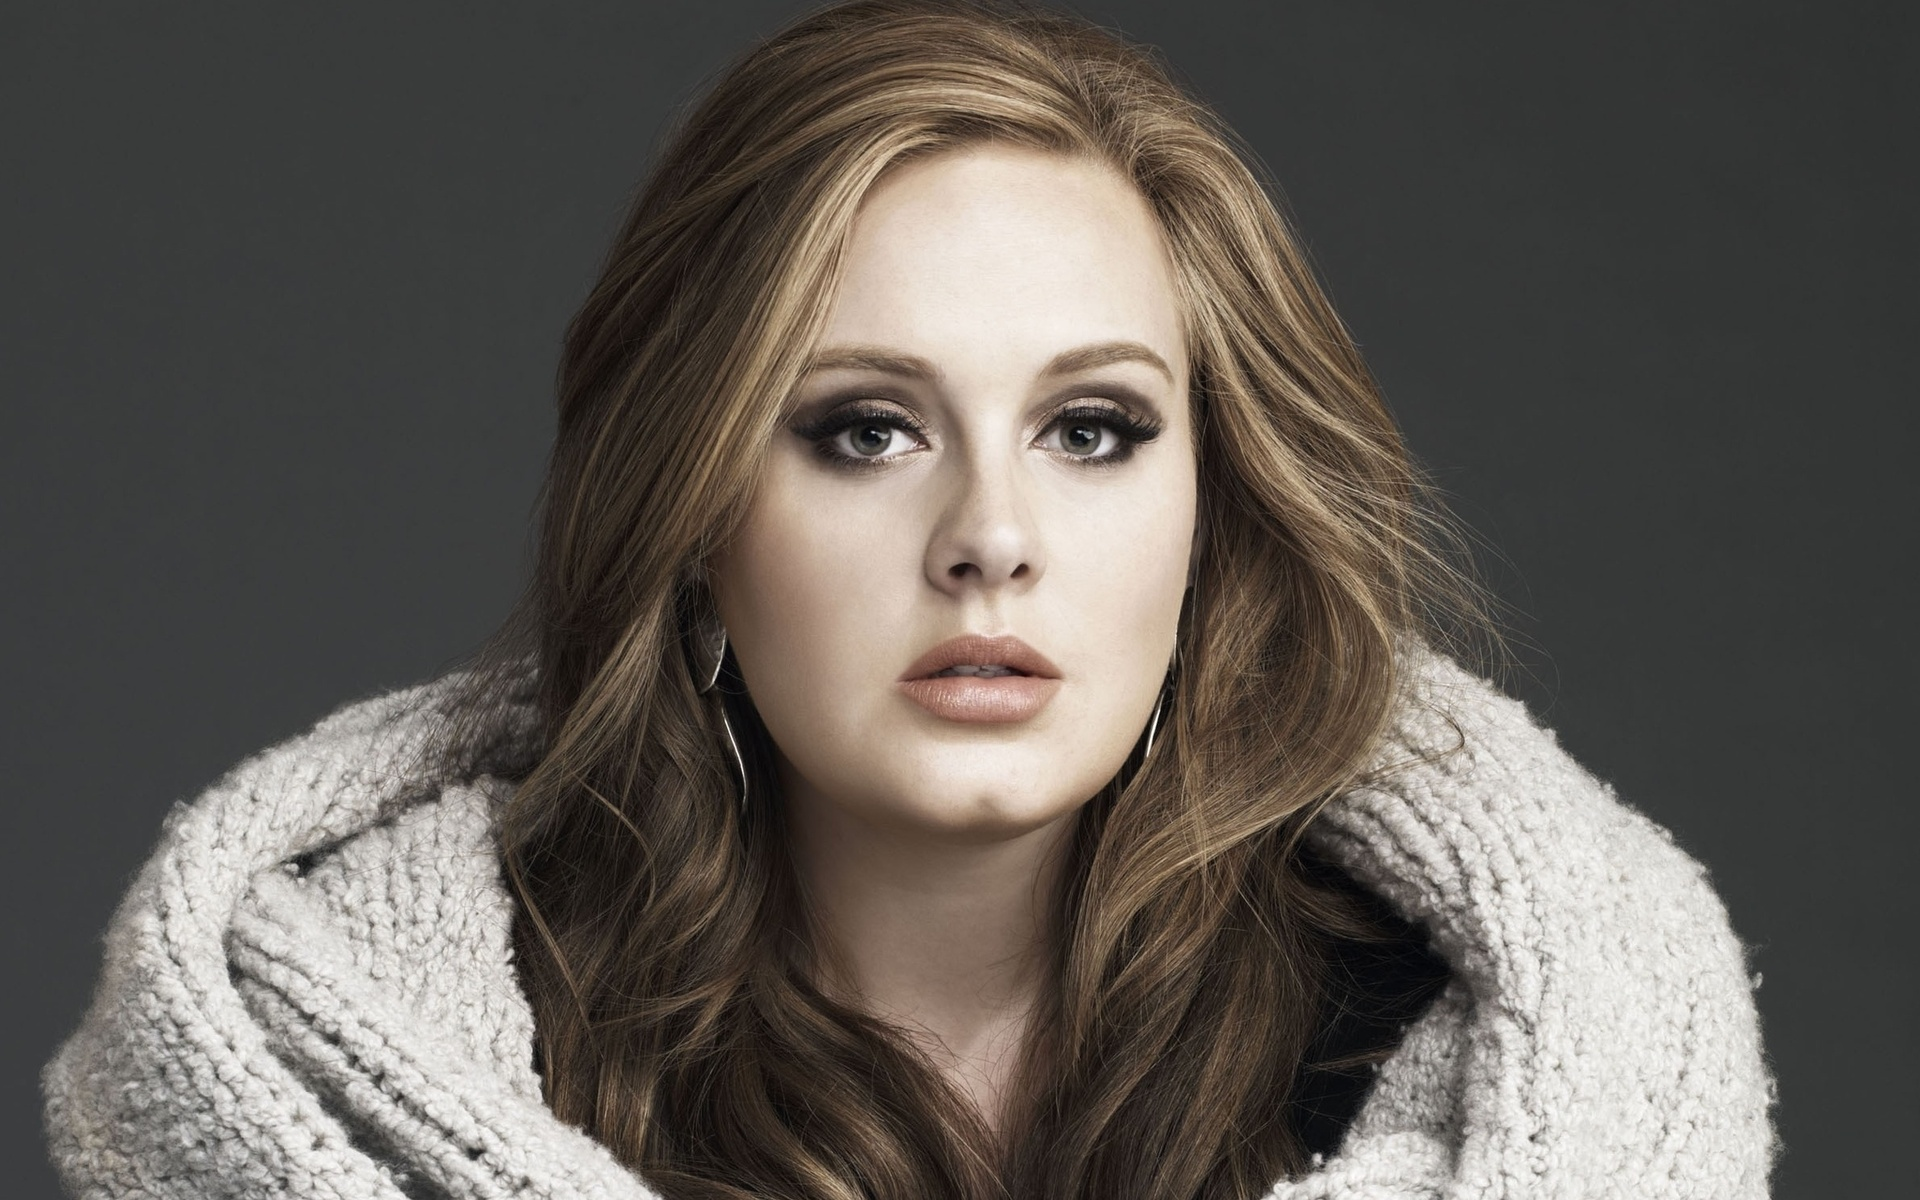 Adele face